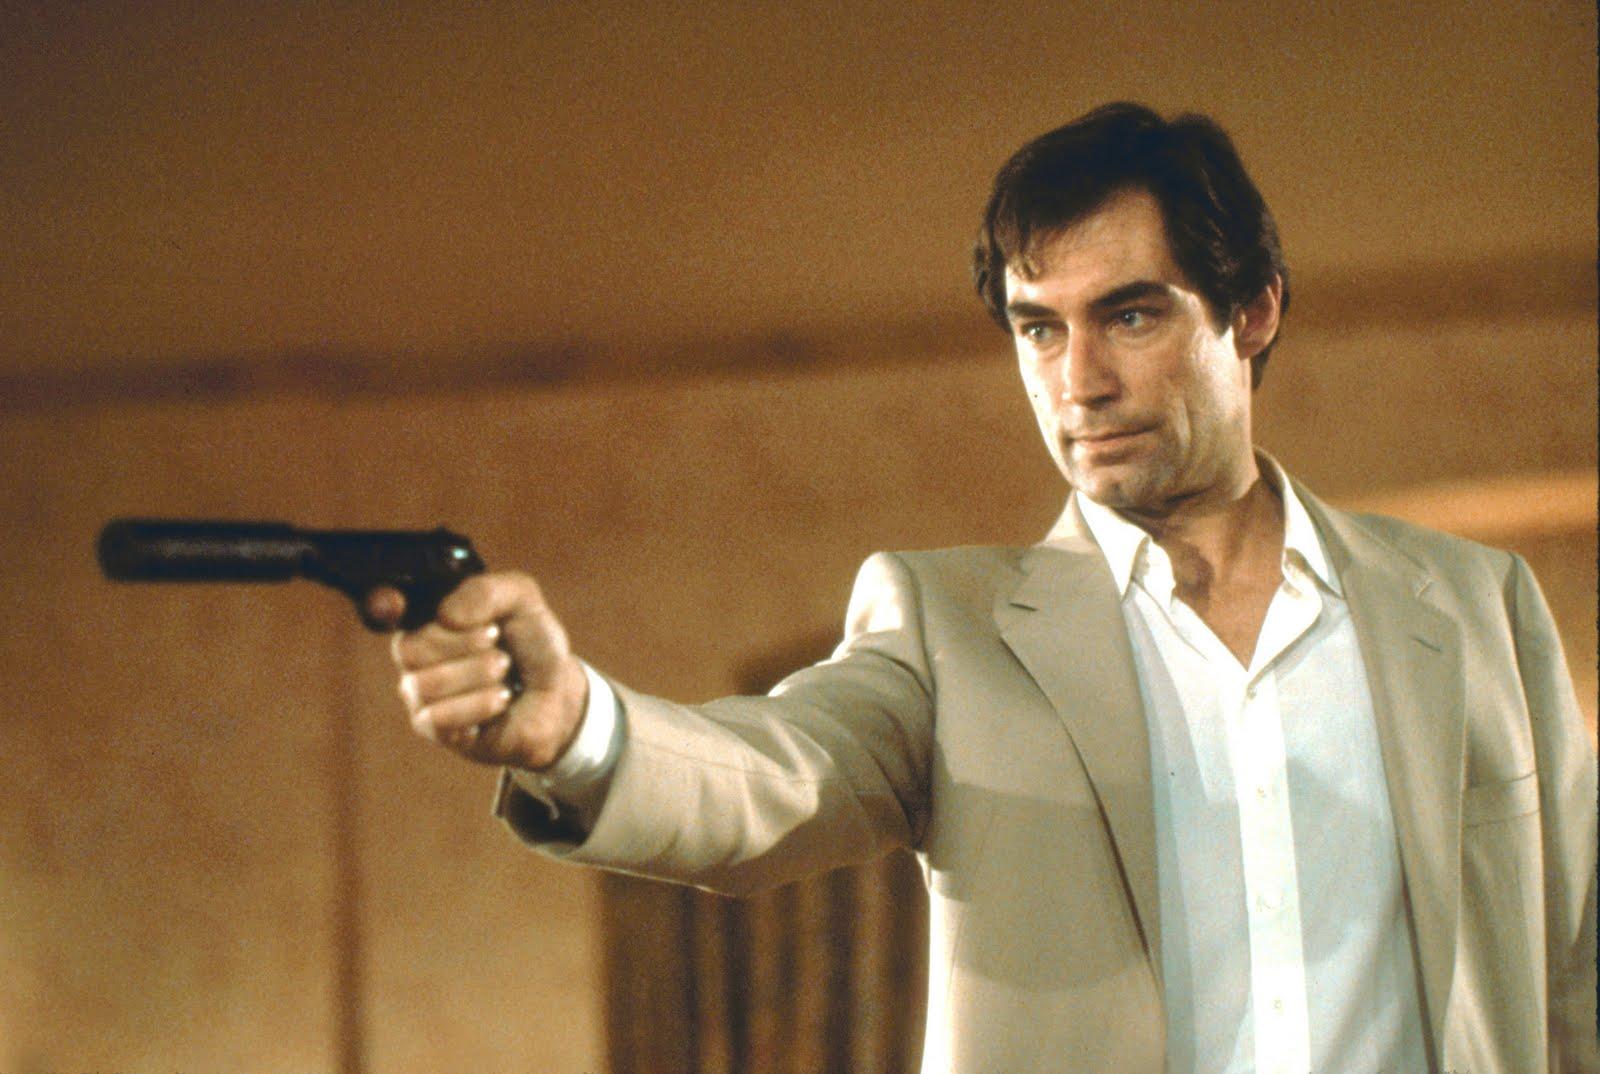 The Spiritual Development Of James Bond (Part III): Timothy Dalton's Avenging Spy